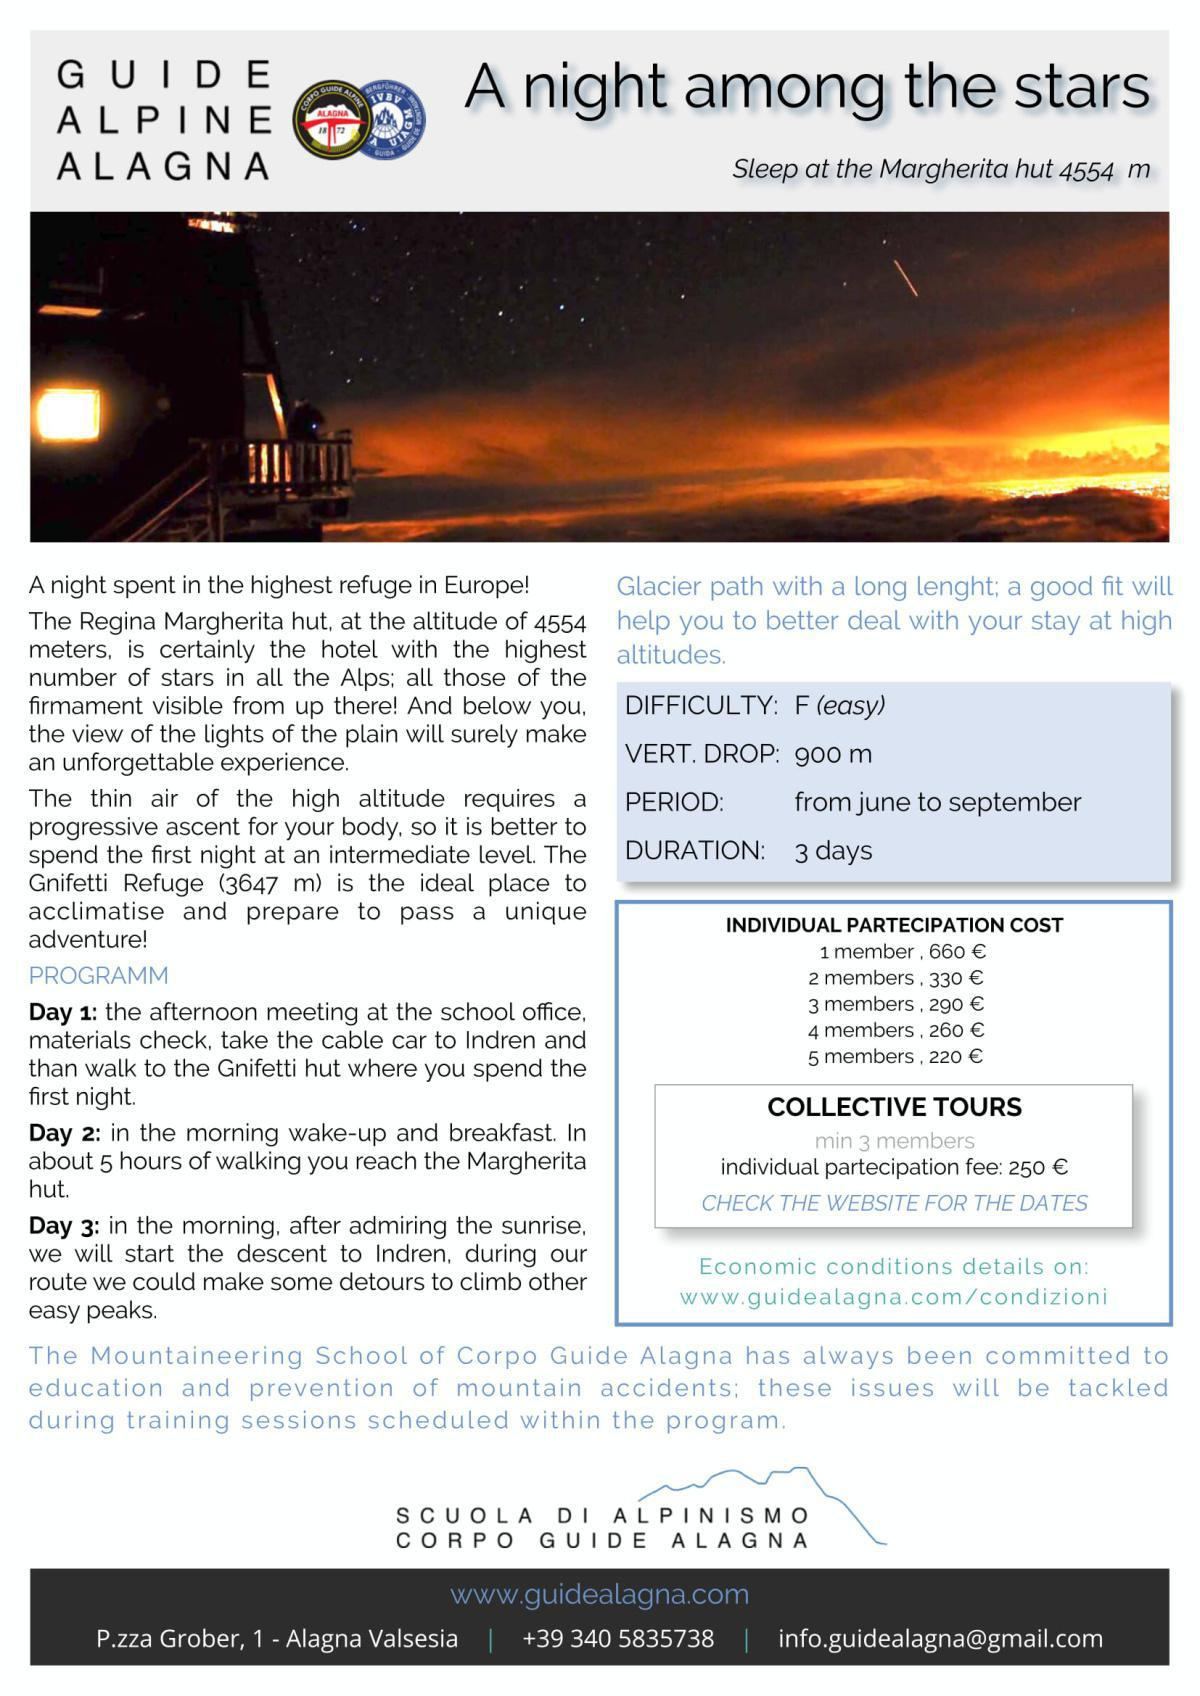 Notte tra le stelle - Guide Alpine Alagna